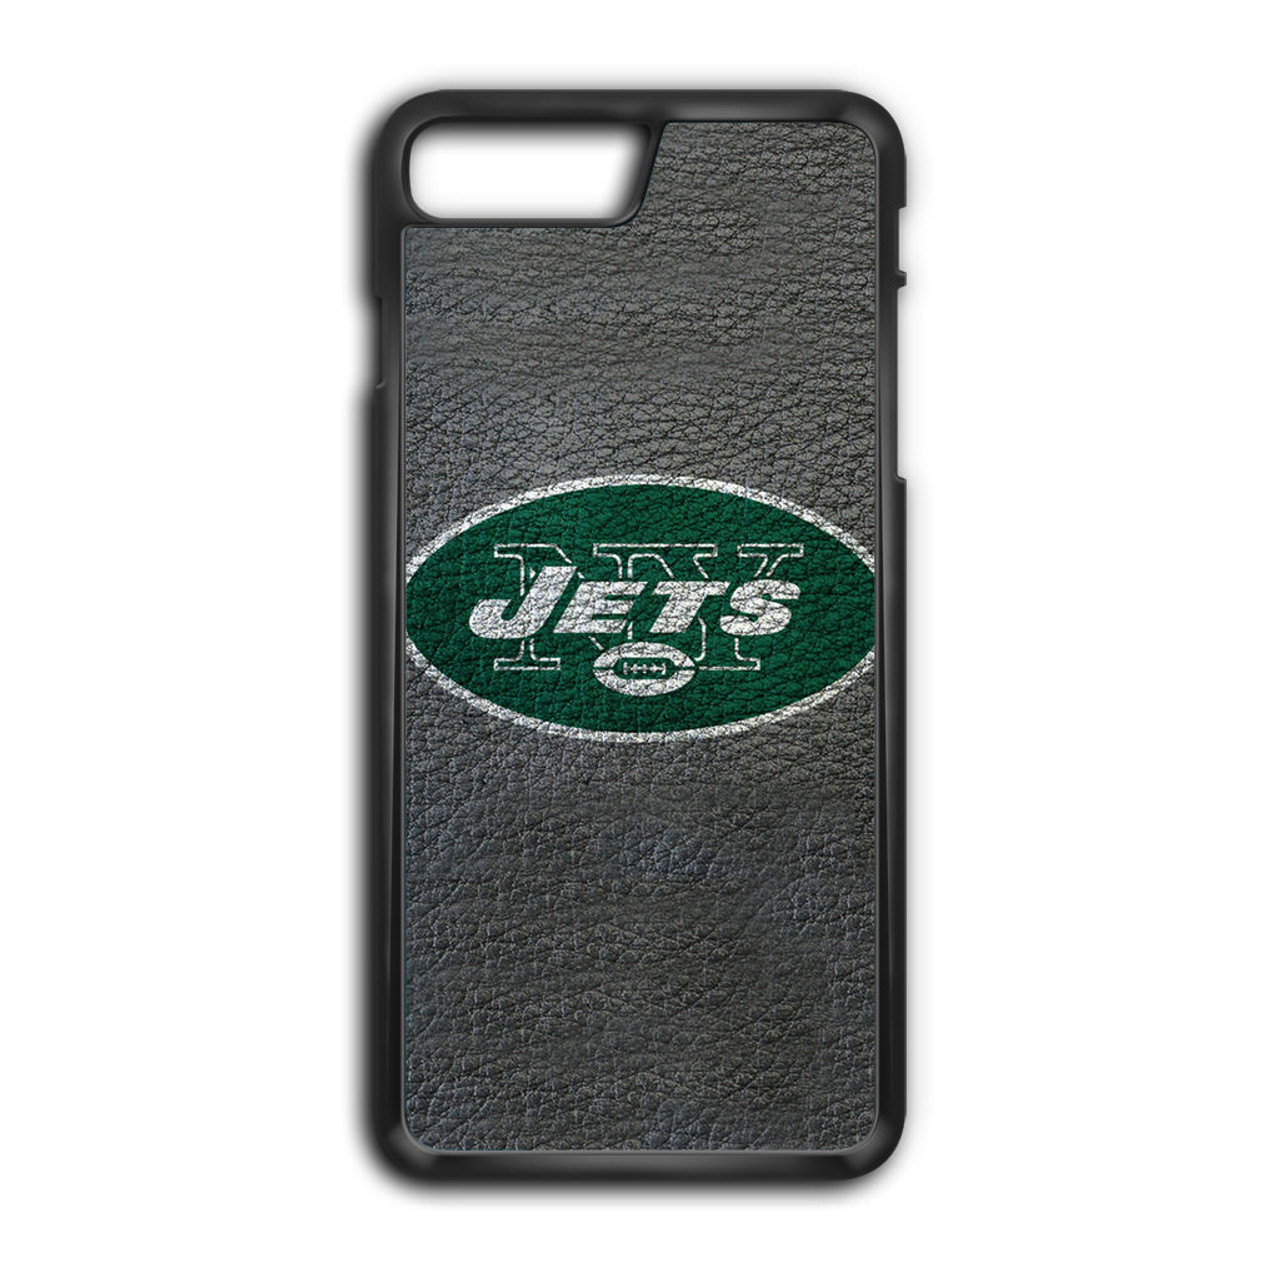 pretty nice 6f96f 4fa76 New York Jets NFL Football iPhone 8 Plus Case